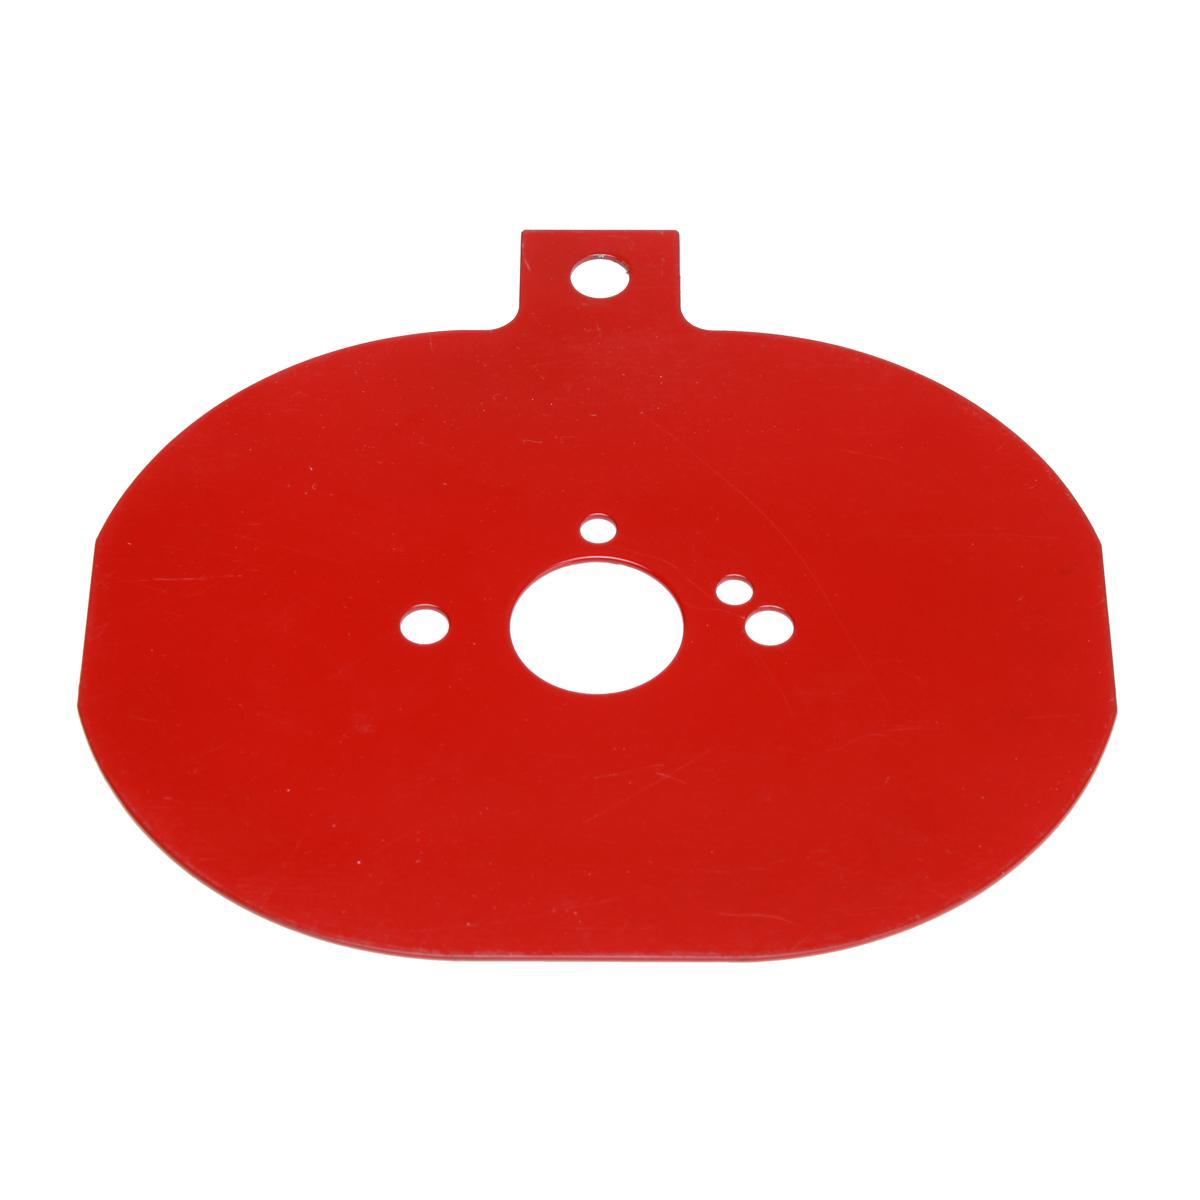 Itg jc20 baseplate 22jc20 from merlin motorsport for Motor base plate design